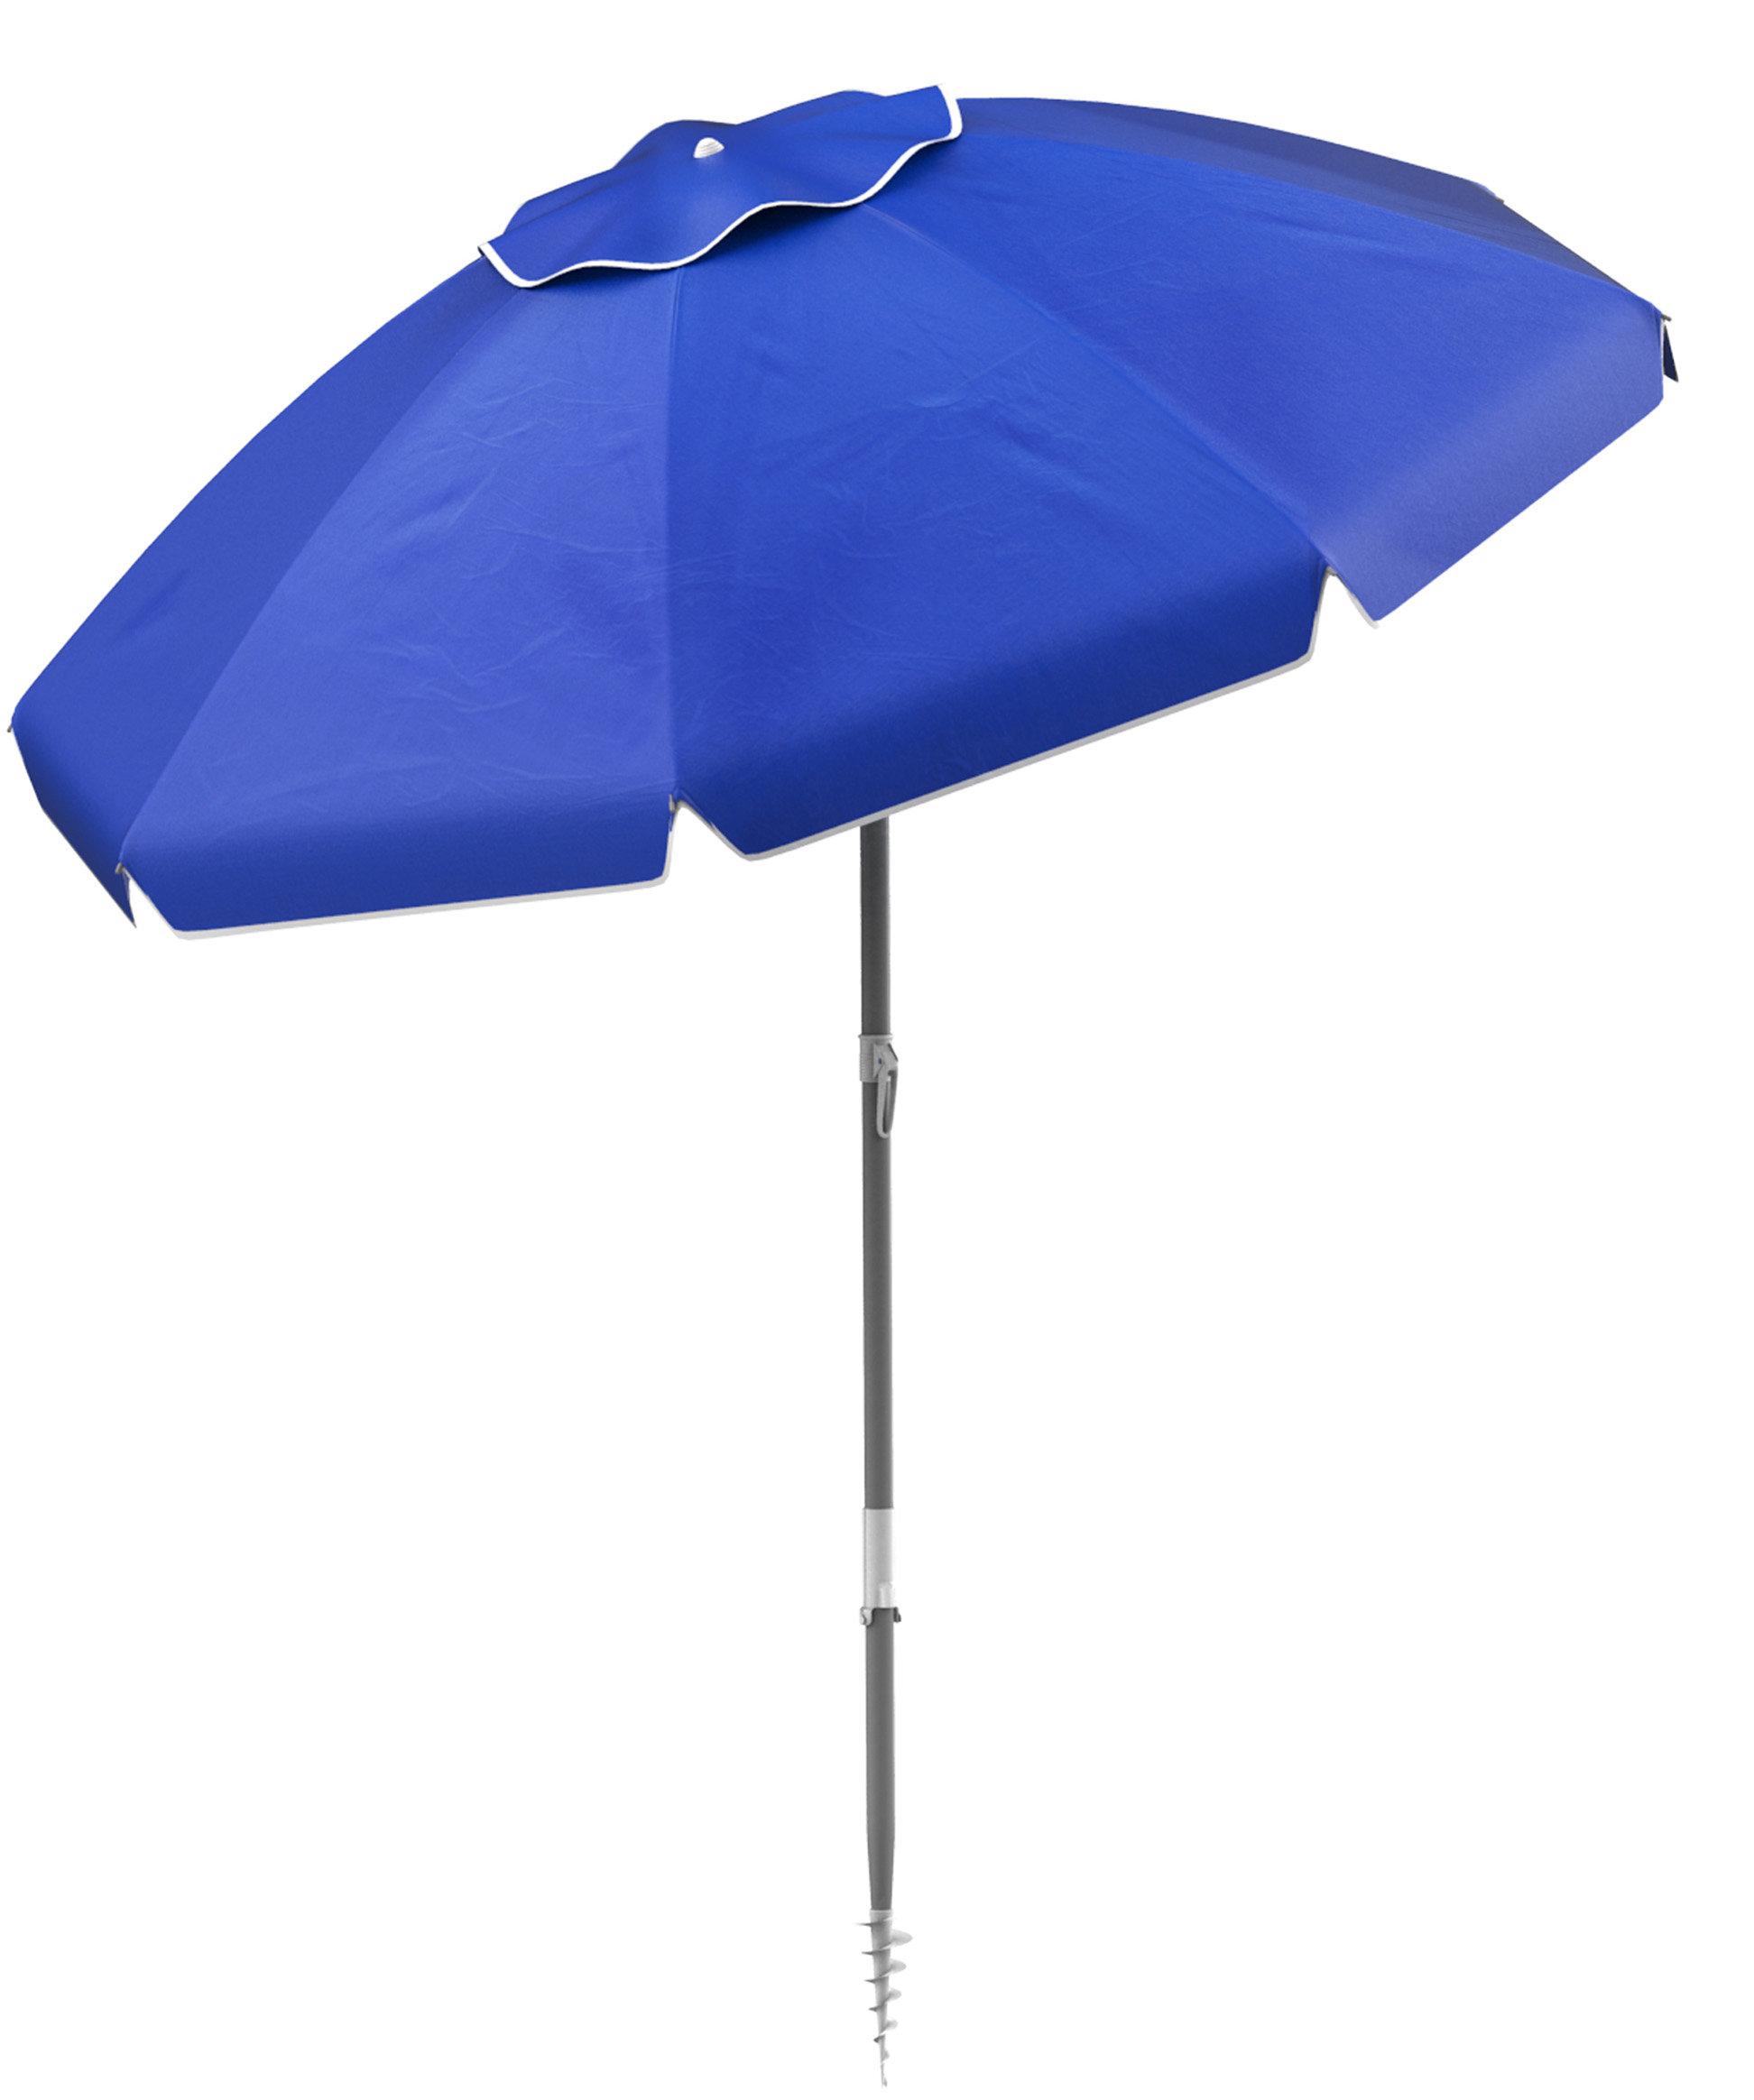 Stanhope Tilting Beach Umbrella Regarding Well Liked Kerner Steel Beach Umbrellas (View 17 of 20)